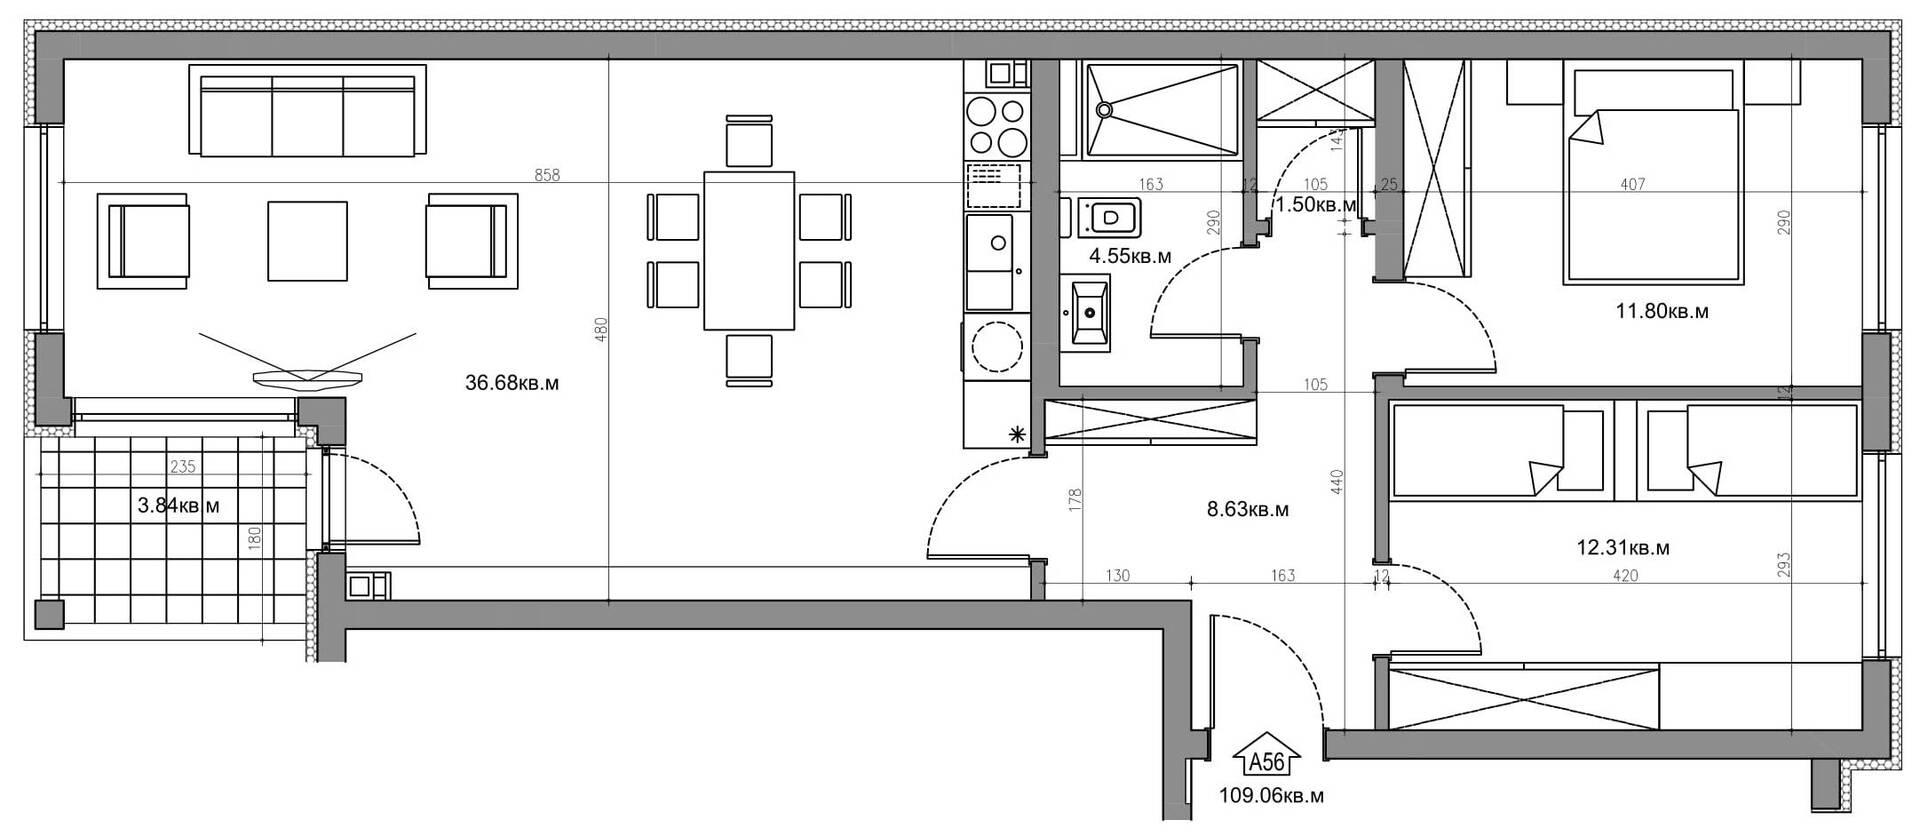 Vinitsa_Apartment_3_56